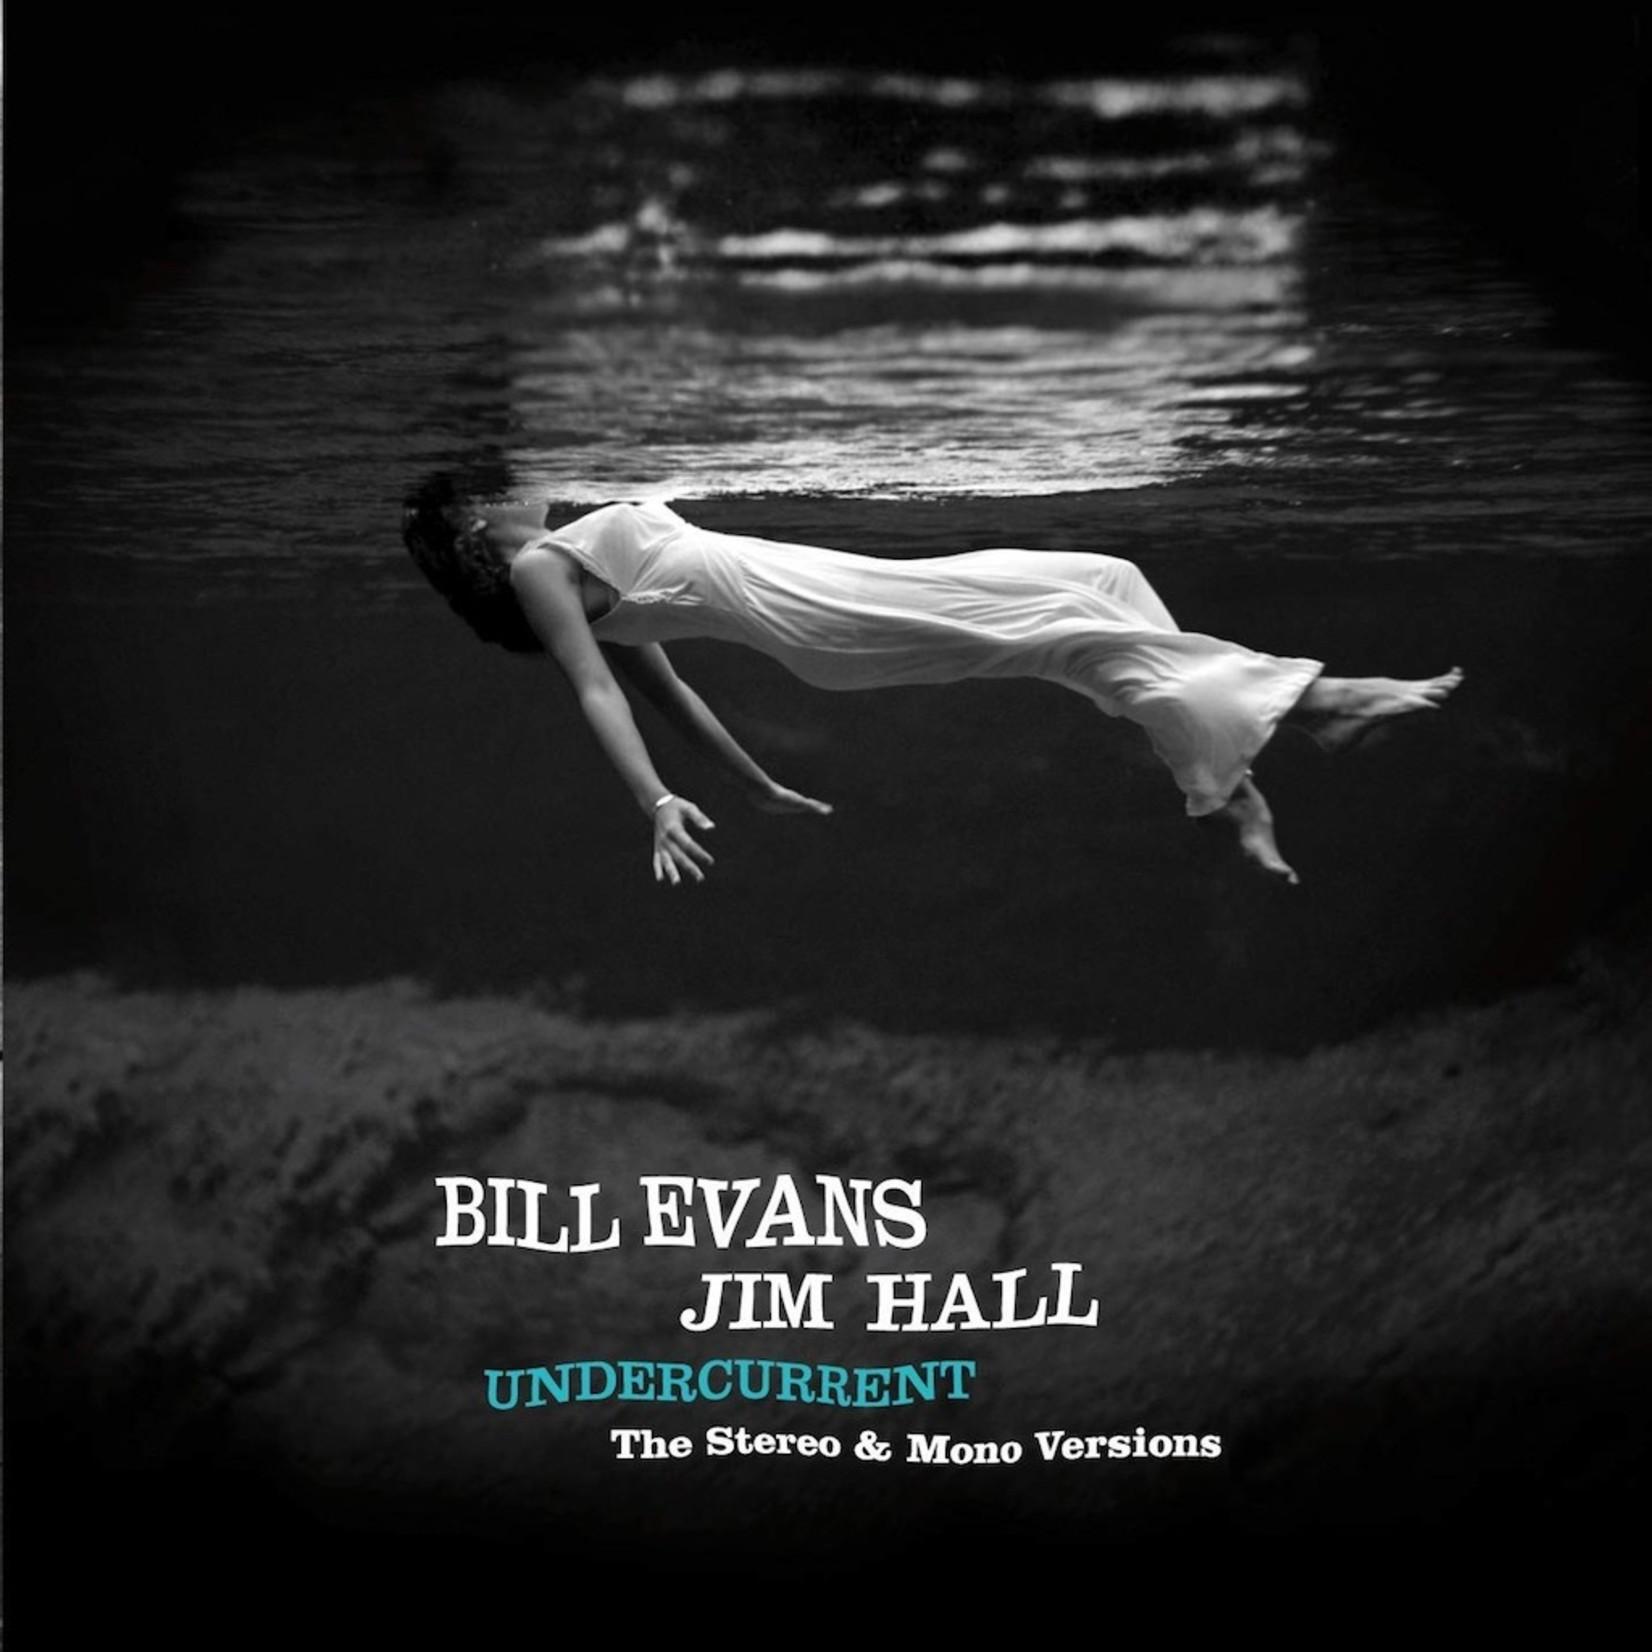 [New] Evans, Bill & Jim Hall: Undercurrent